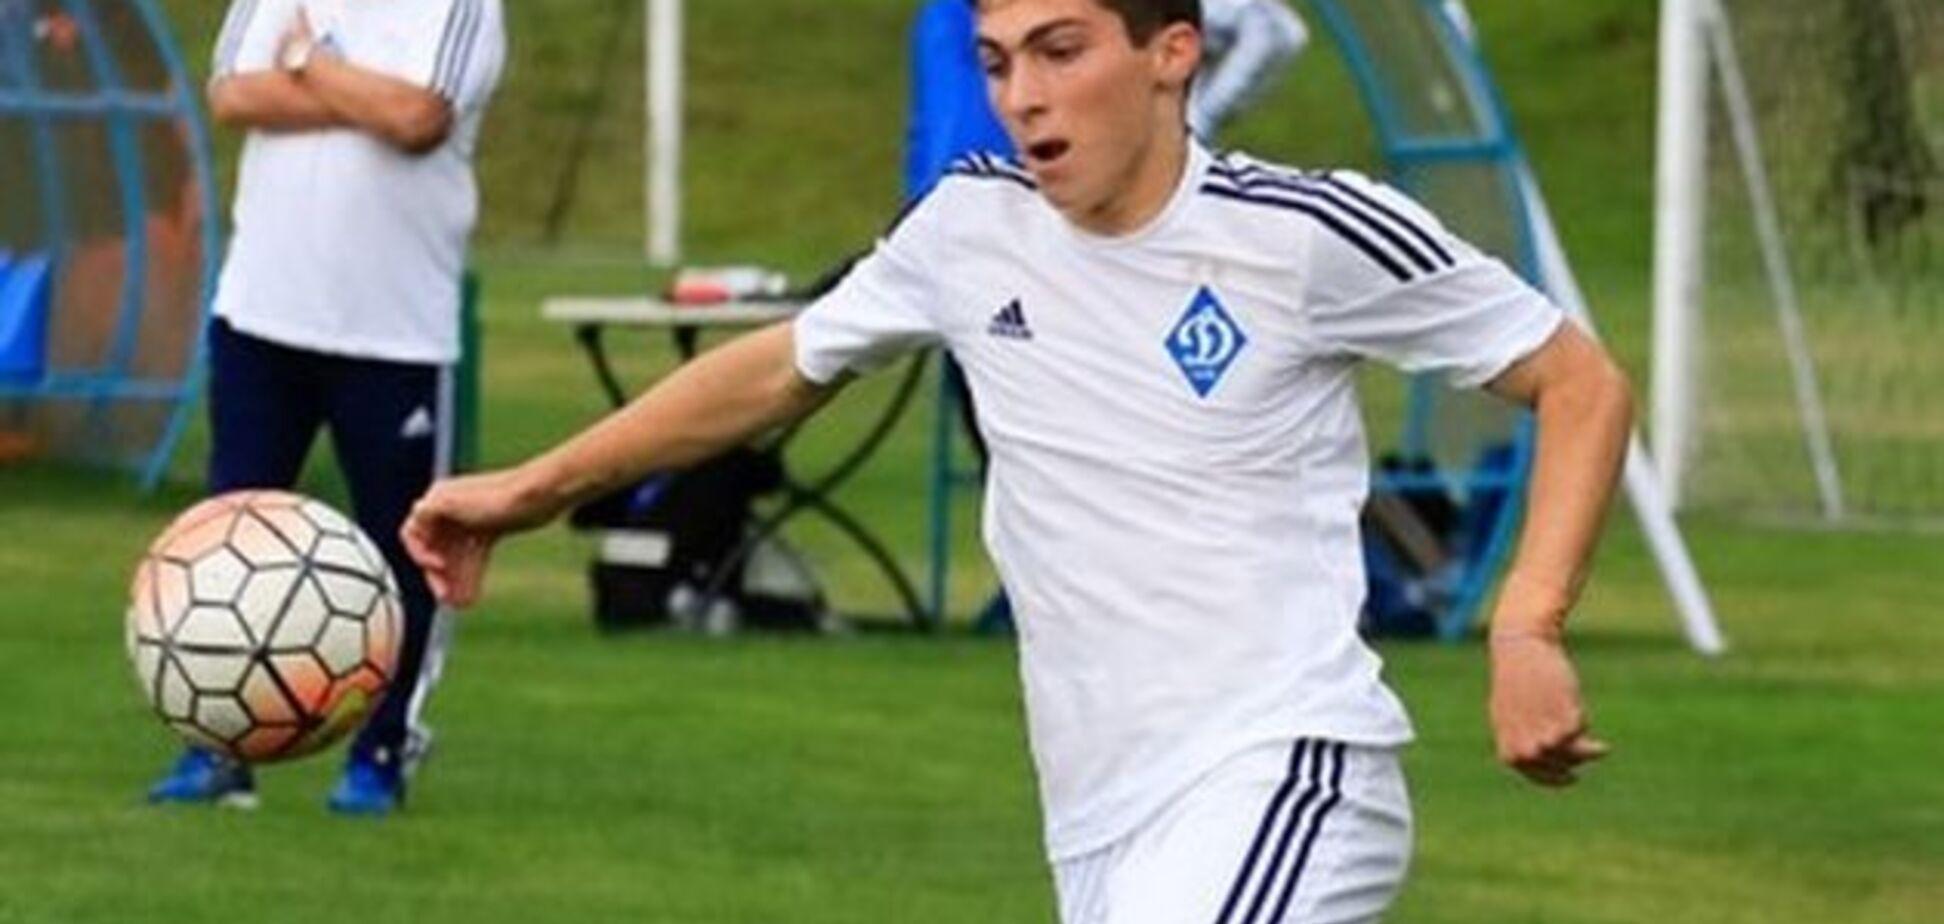 Молодой талант 'Динамо' может перейти в 'Шахтер'